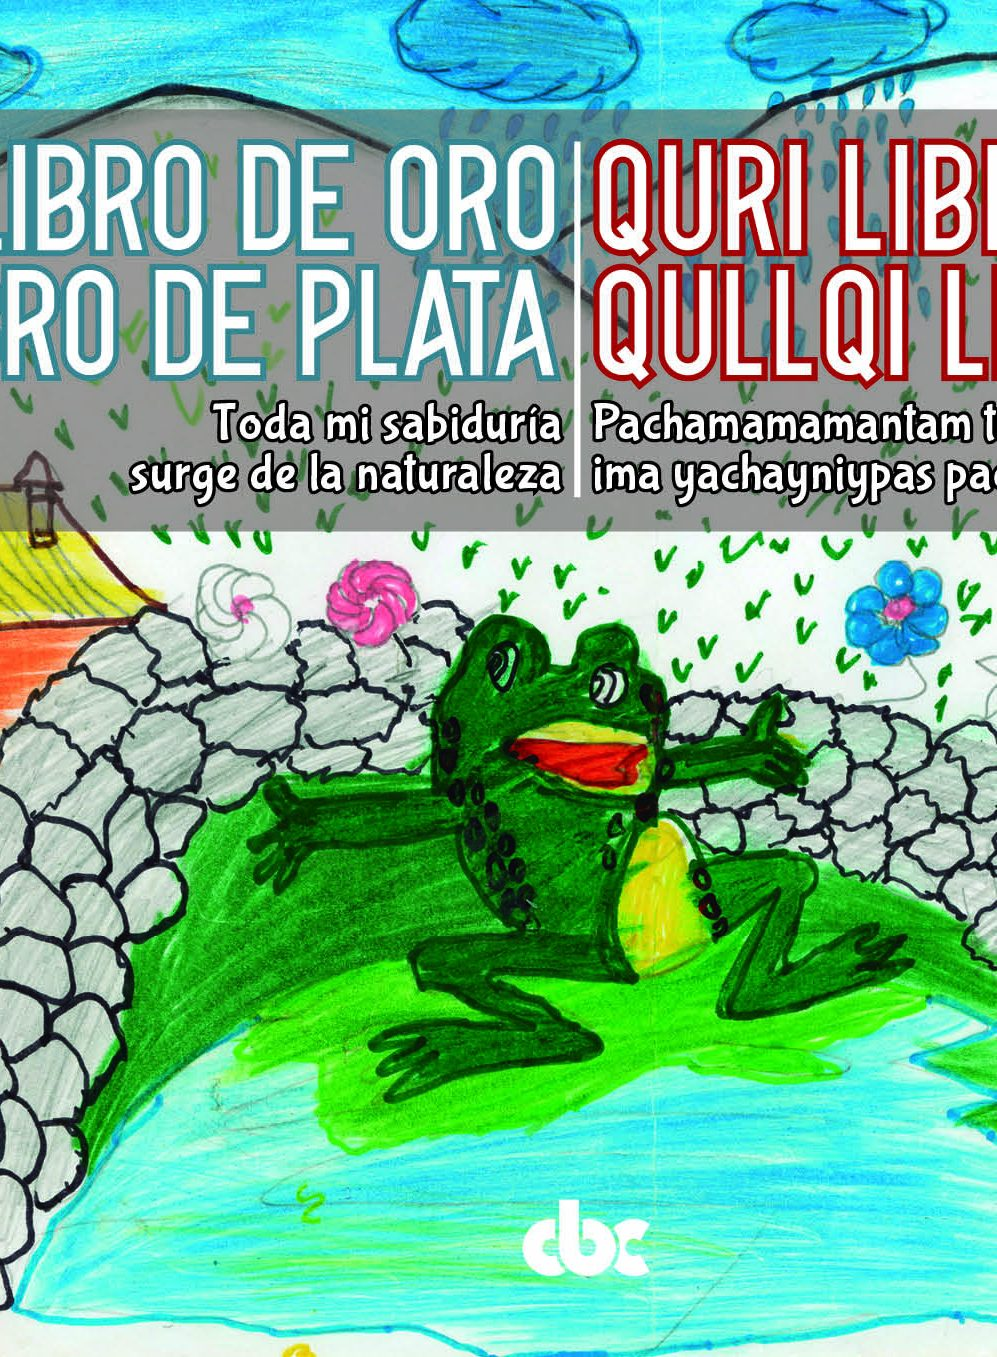 Quri libro, Qullqi libro